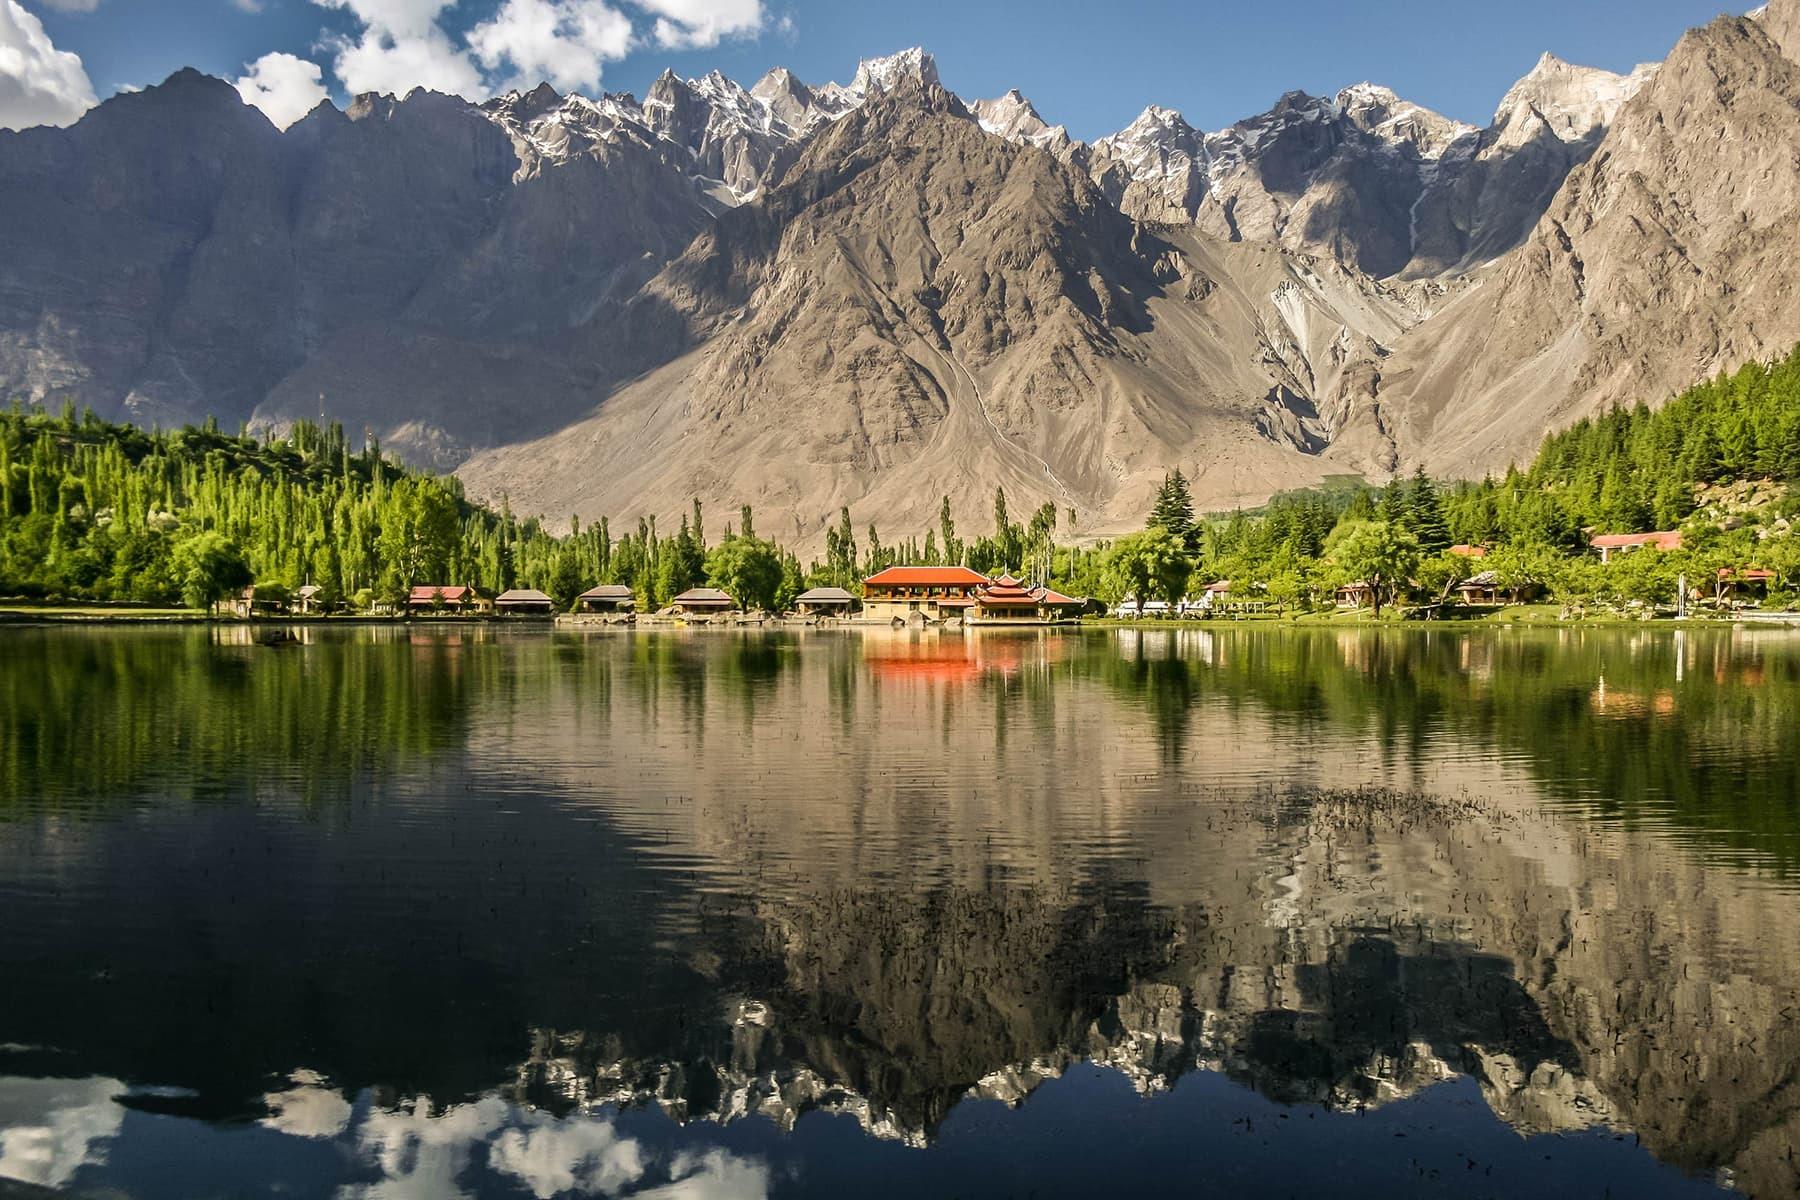 First place:2015 winner comes from Lower Kachura Lake, a popular tourist destination in Central Karakoram National Park, Skardu, Pakistan. — Image by Zaeem Siddiq